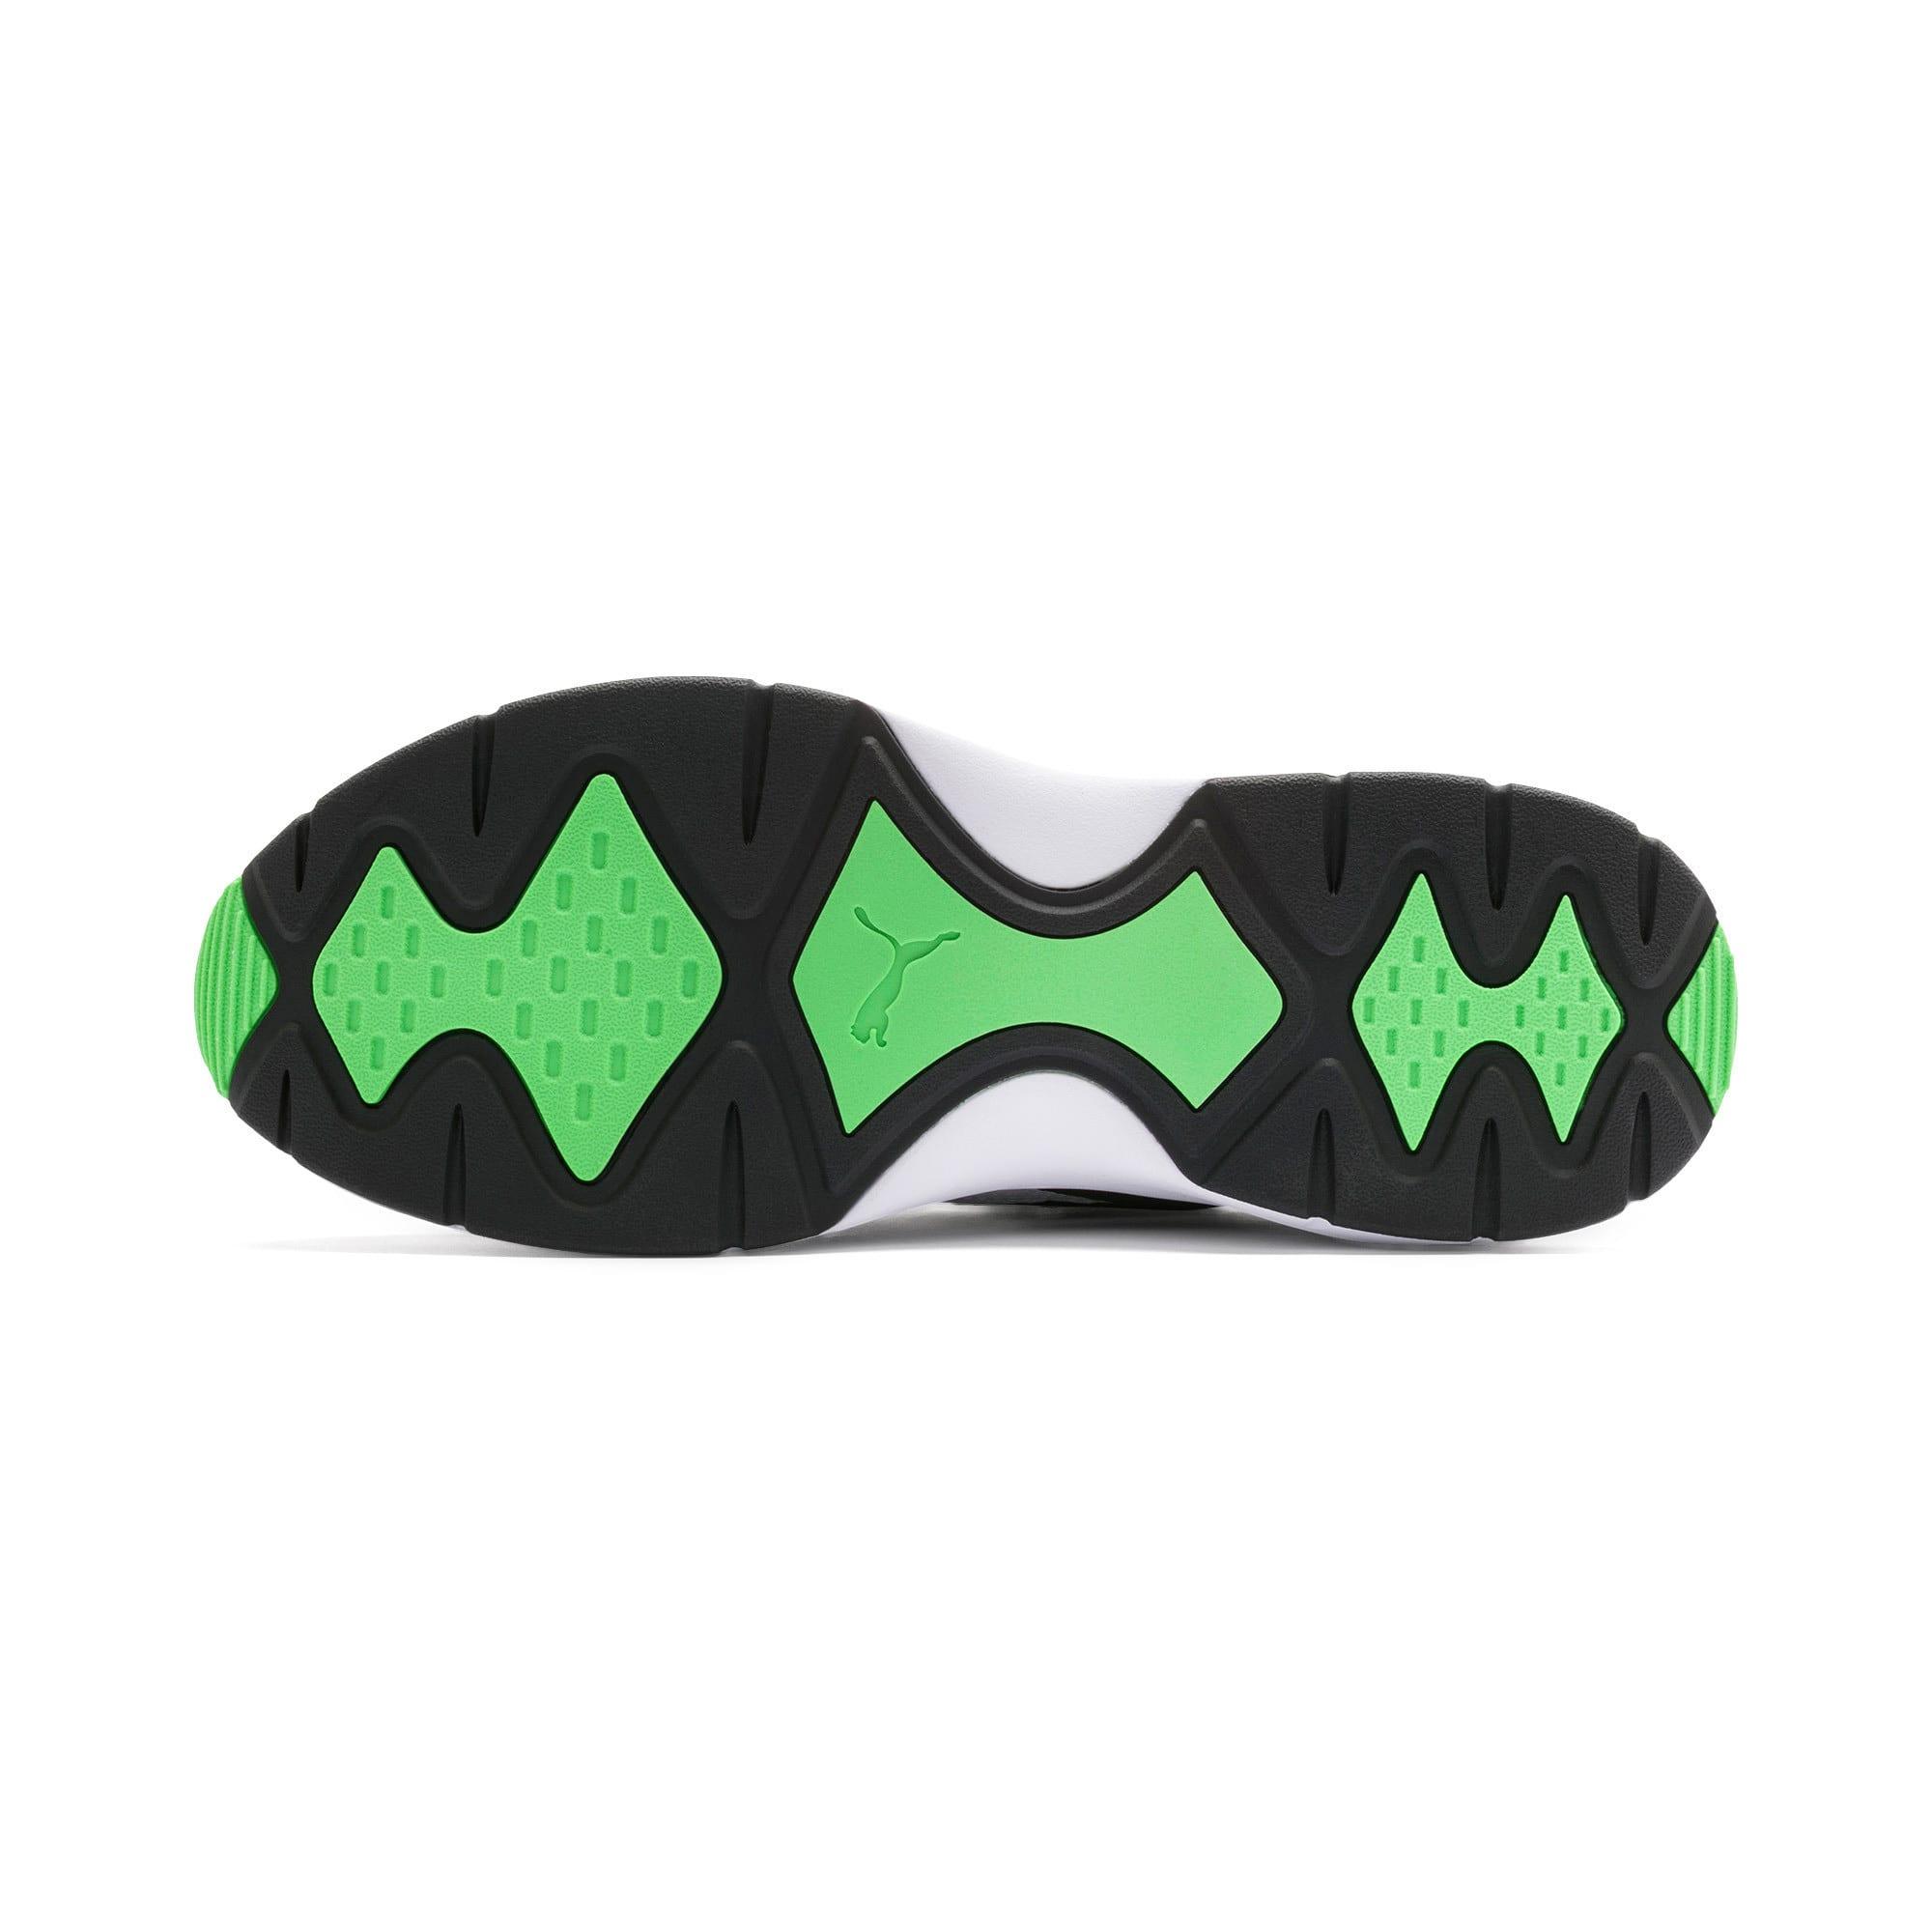 Imagen en miniatura 5 de Zapatillas de training Nucleus, Puma Black-Classic Green, mediana